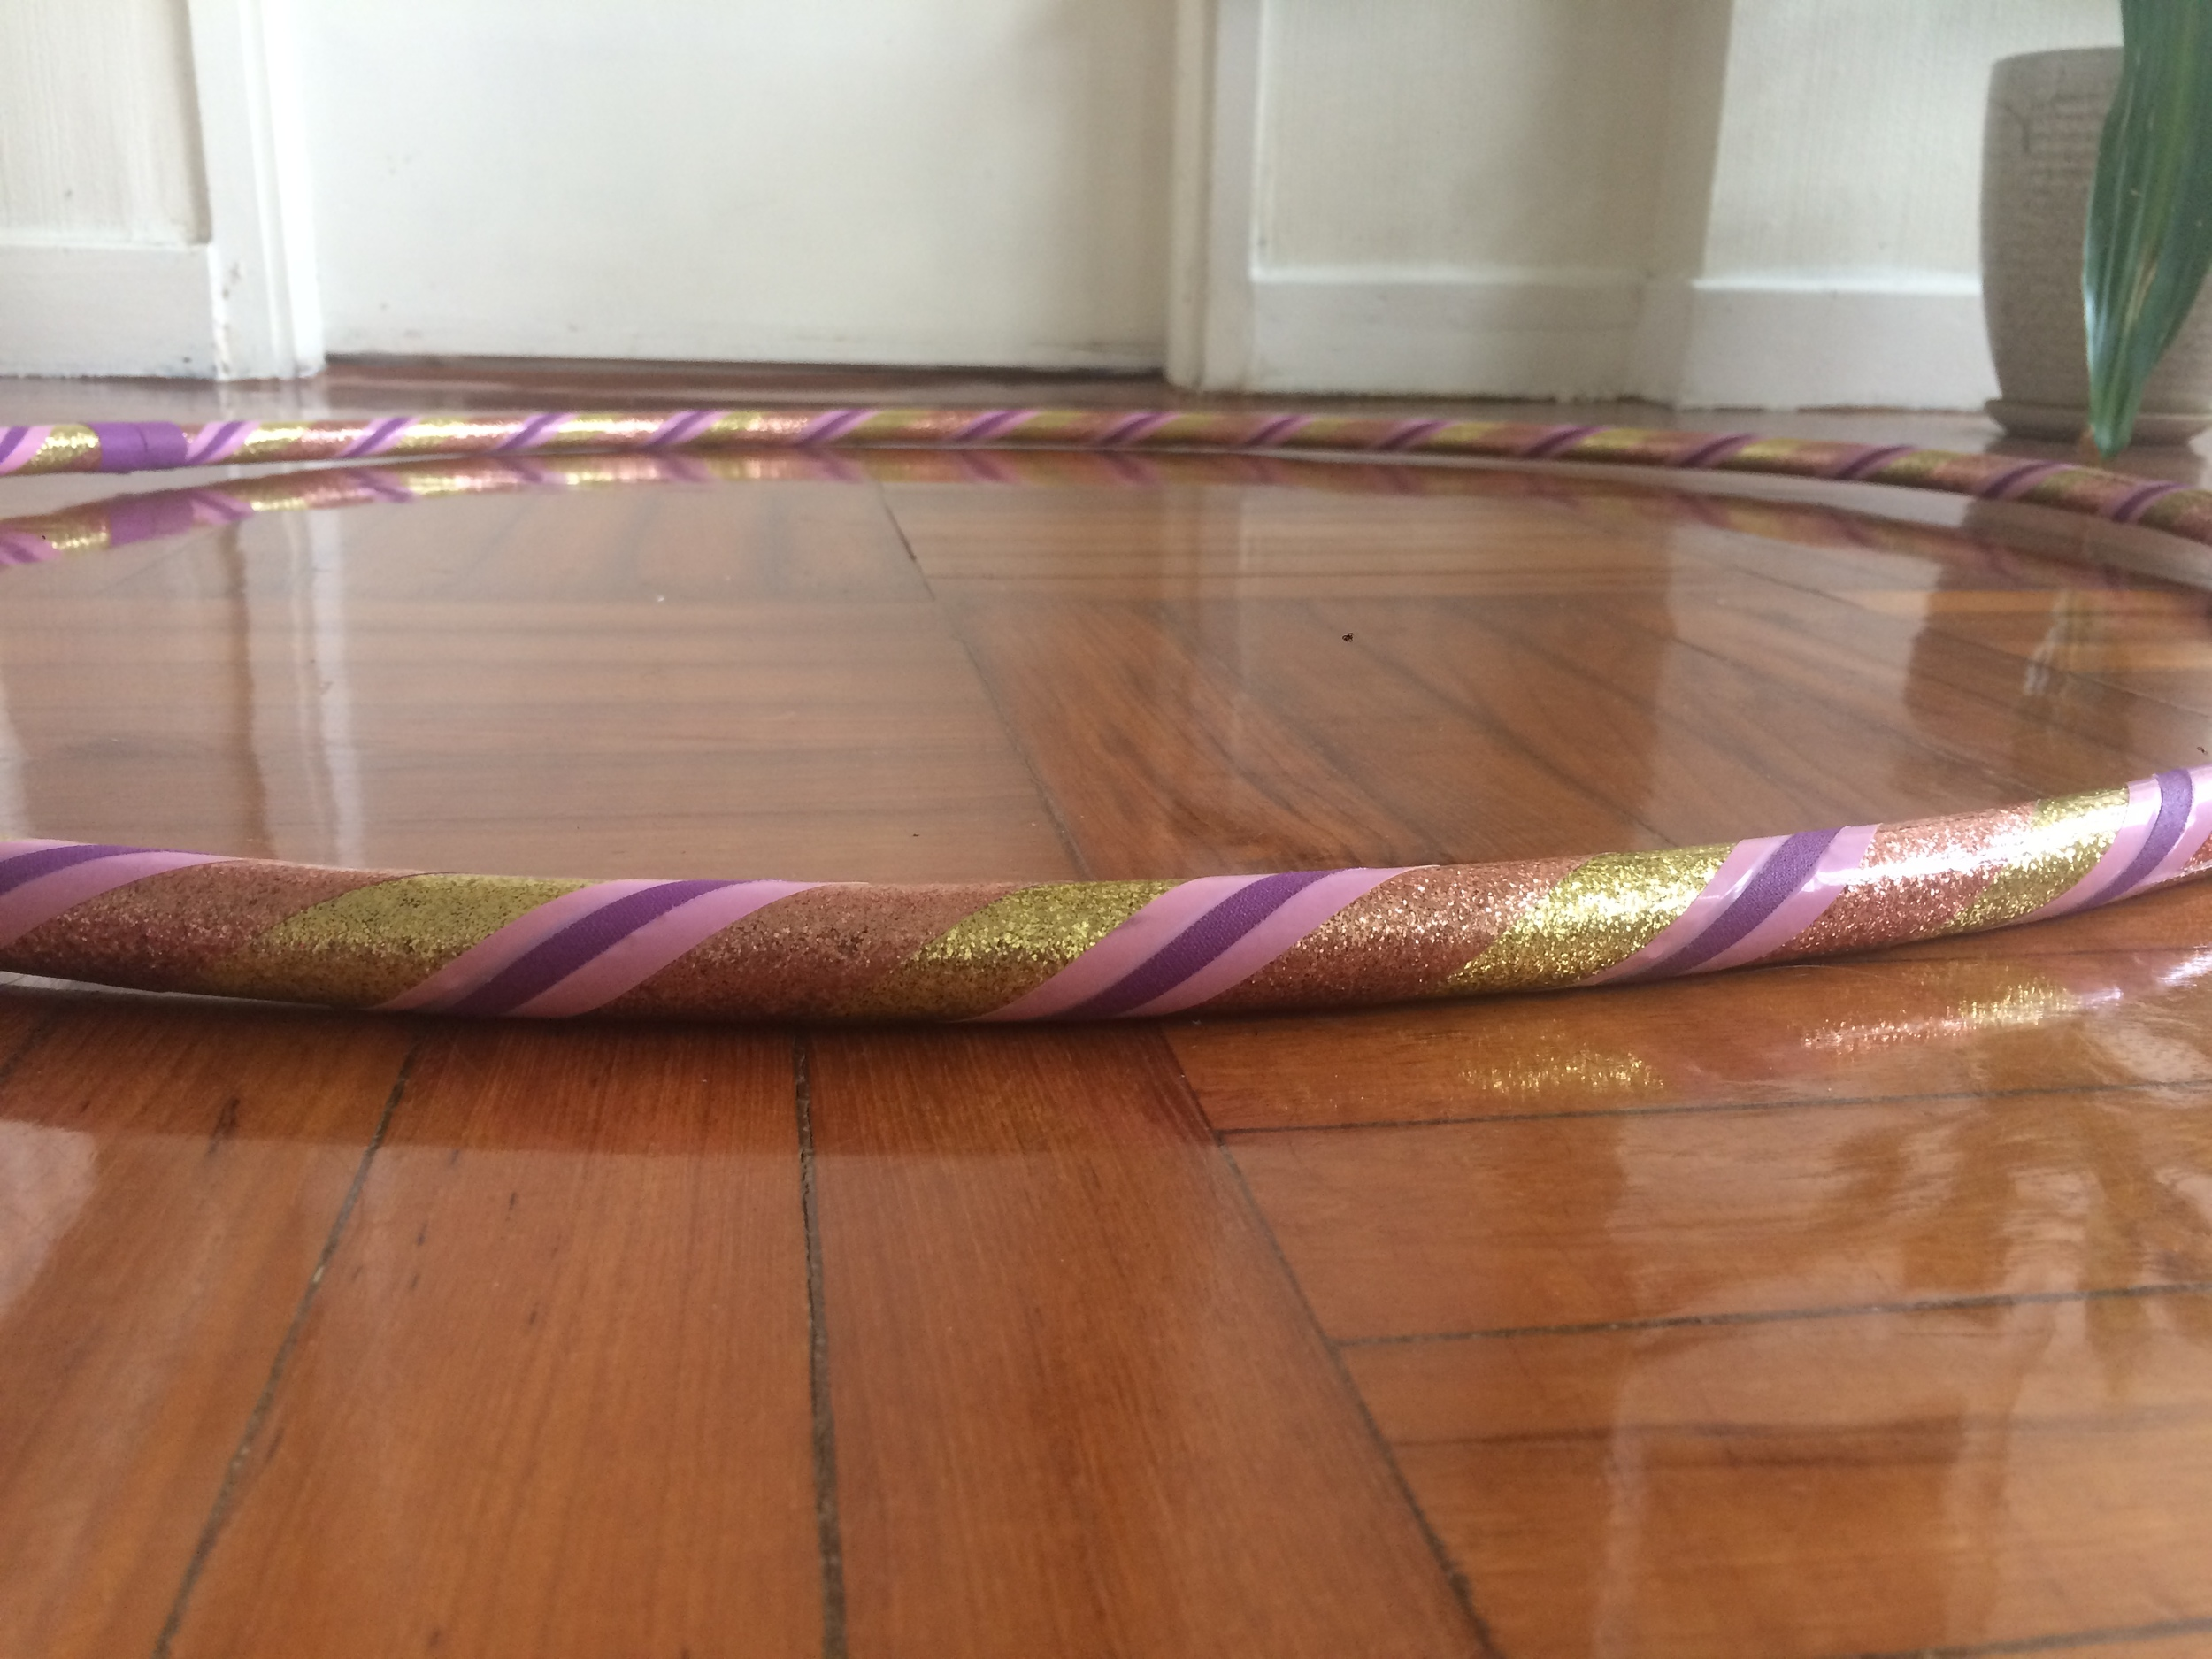 buy a hula hoop hong kong 香港呼啦圈